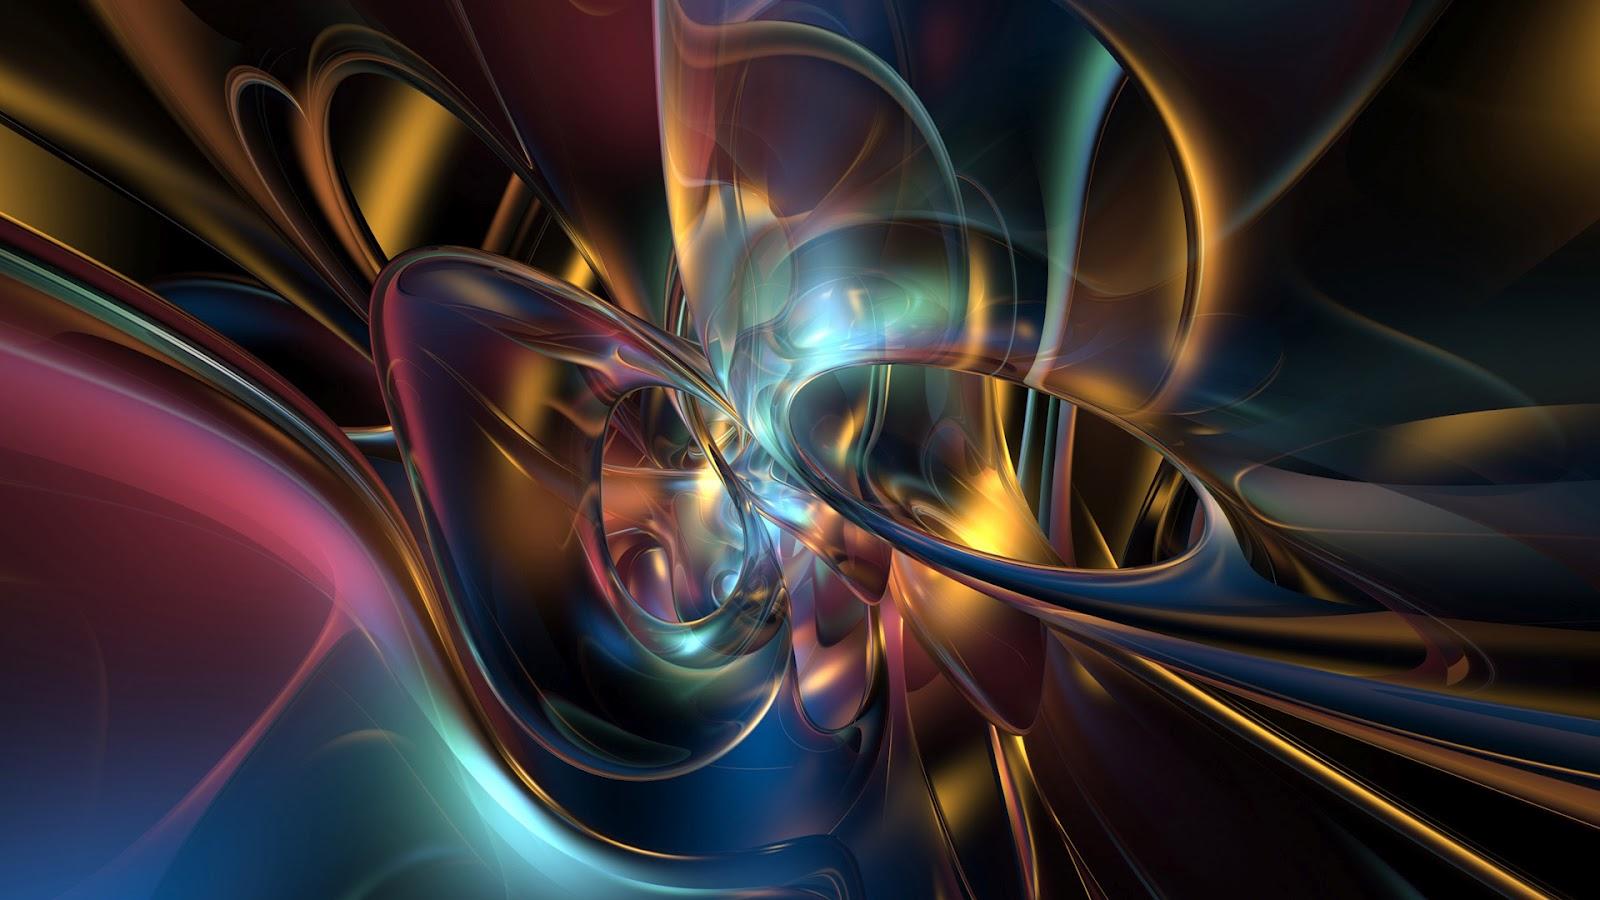 http://2.bp.blogspot.com/-DH7LiY6xTic/T9jWPXgX-xI/AAAAAAAAA7s/cKg2IlFsrL4/s1600/abstract-hd-wallpapers-1080p-1.jpg